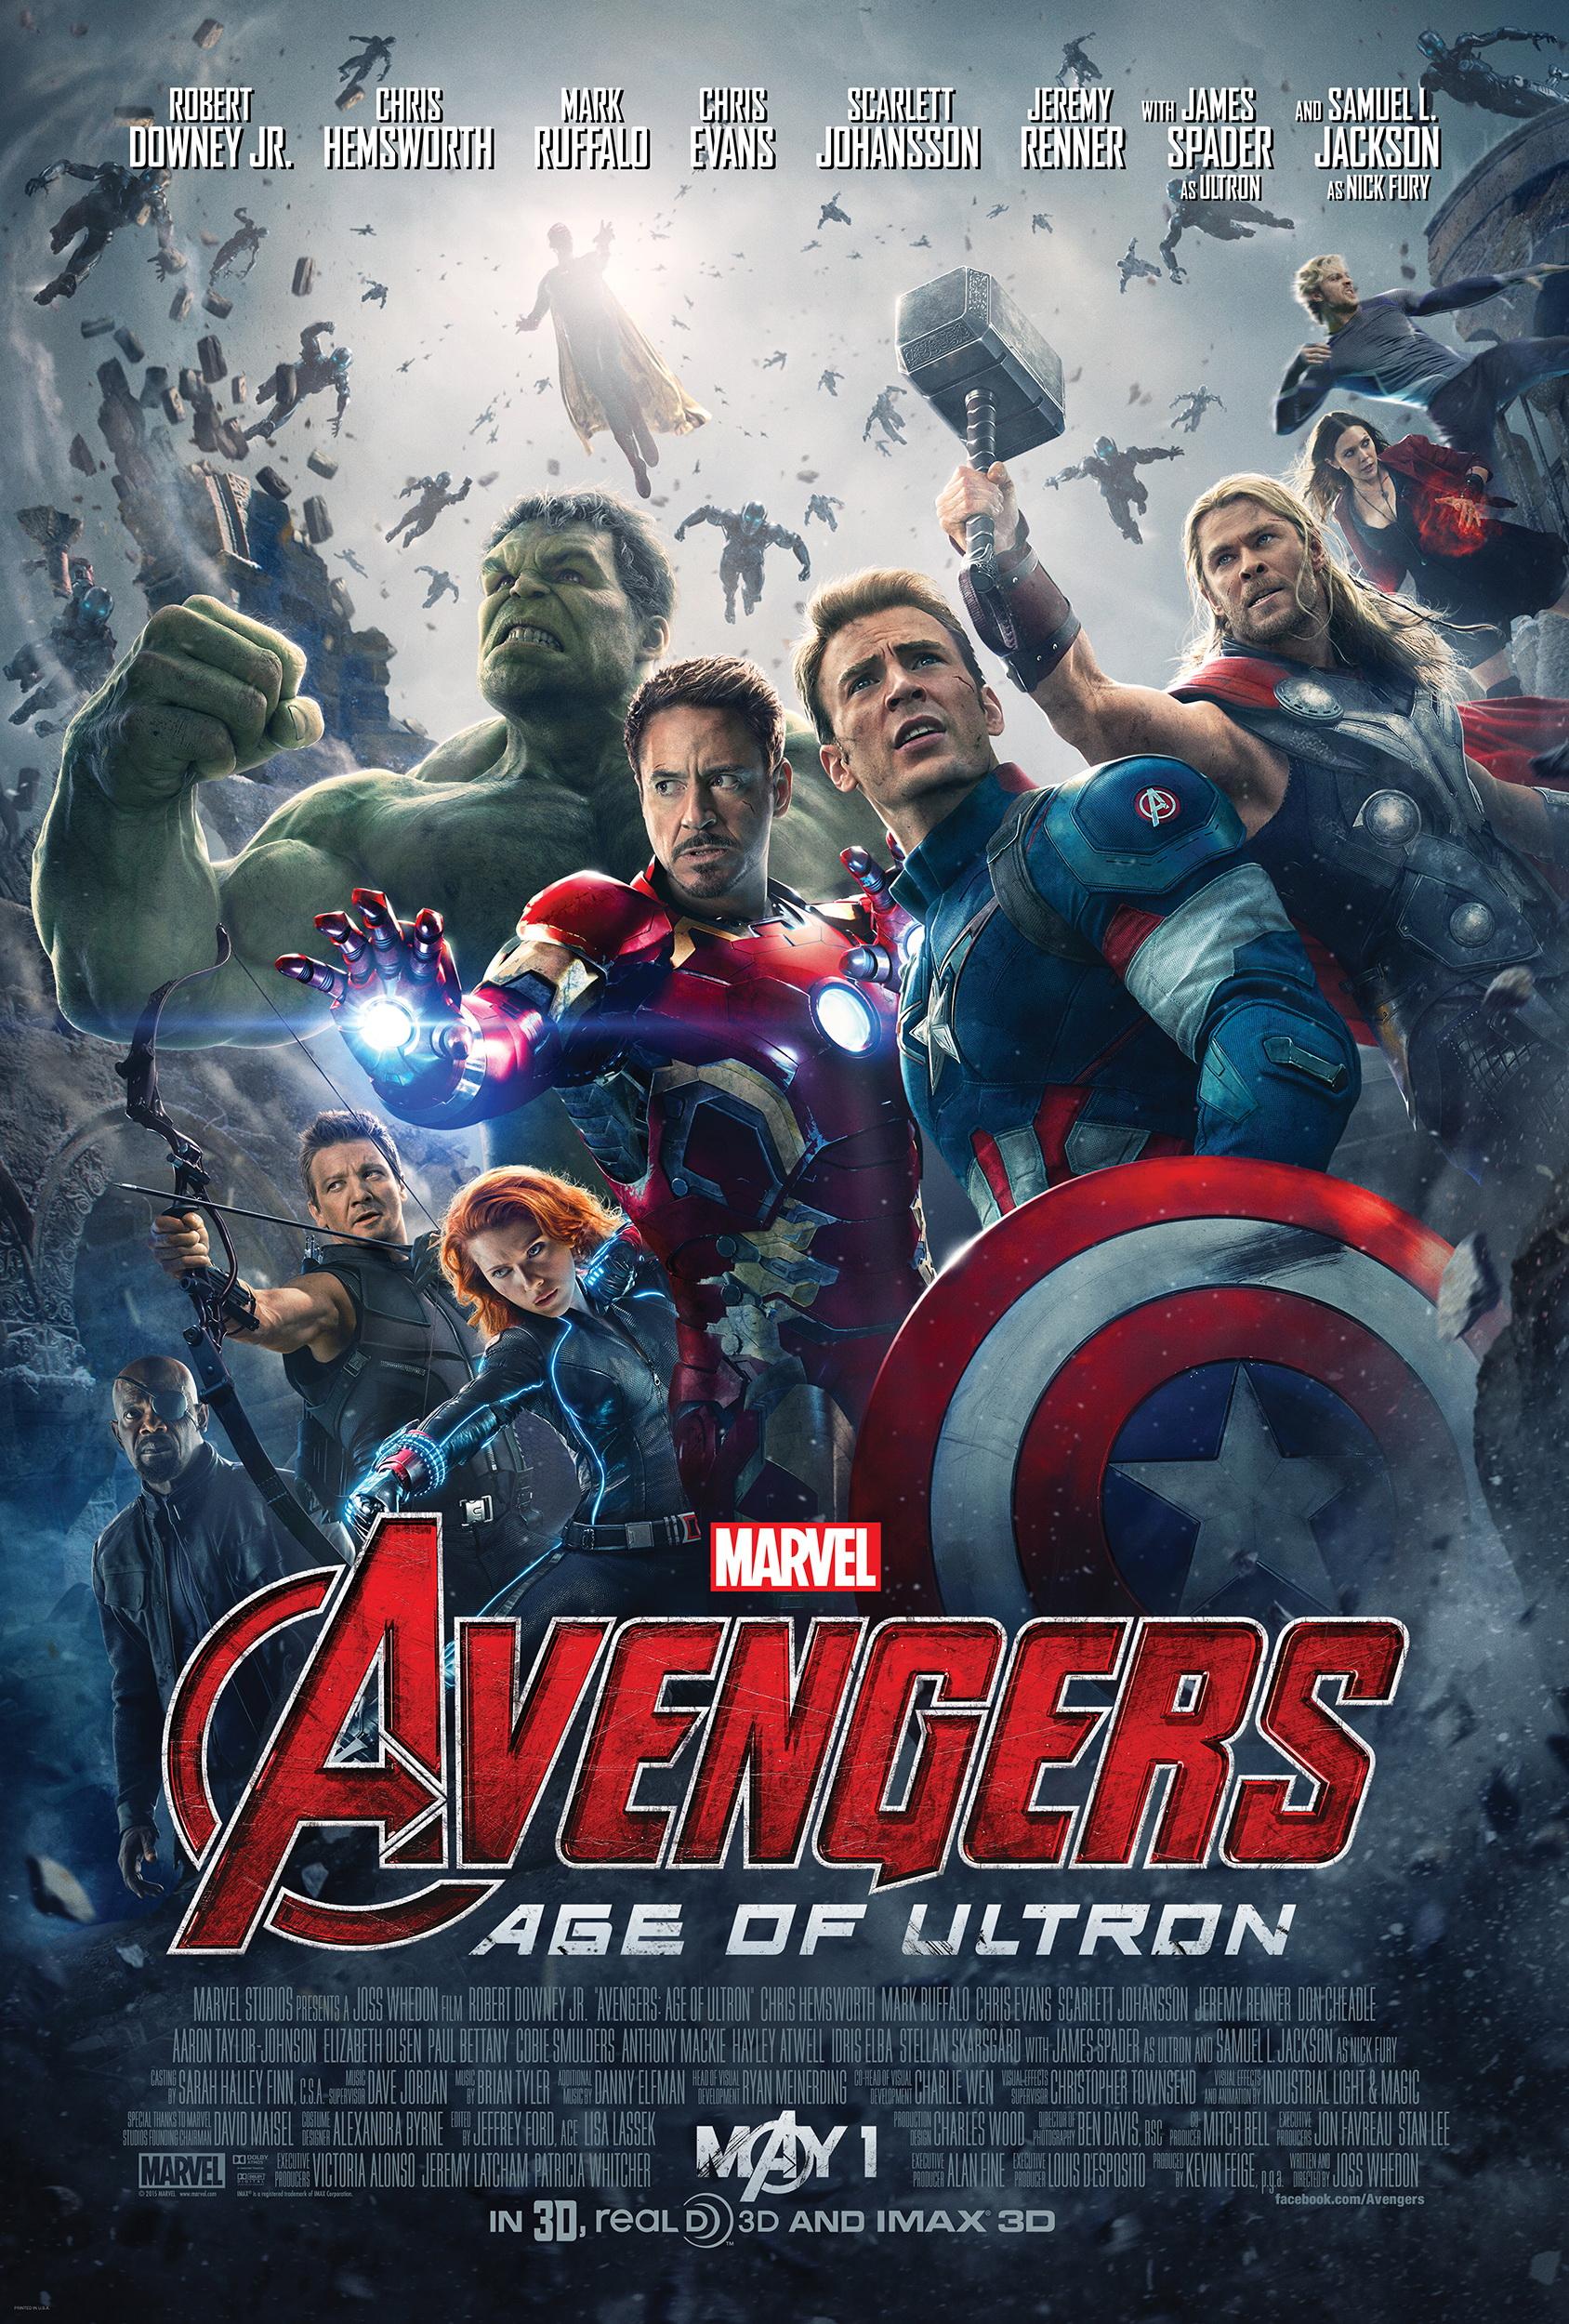 avengers_age_of_ultron-poster1.jpg